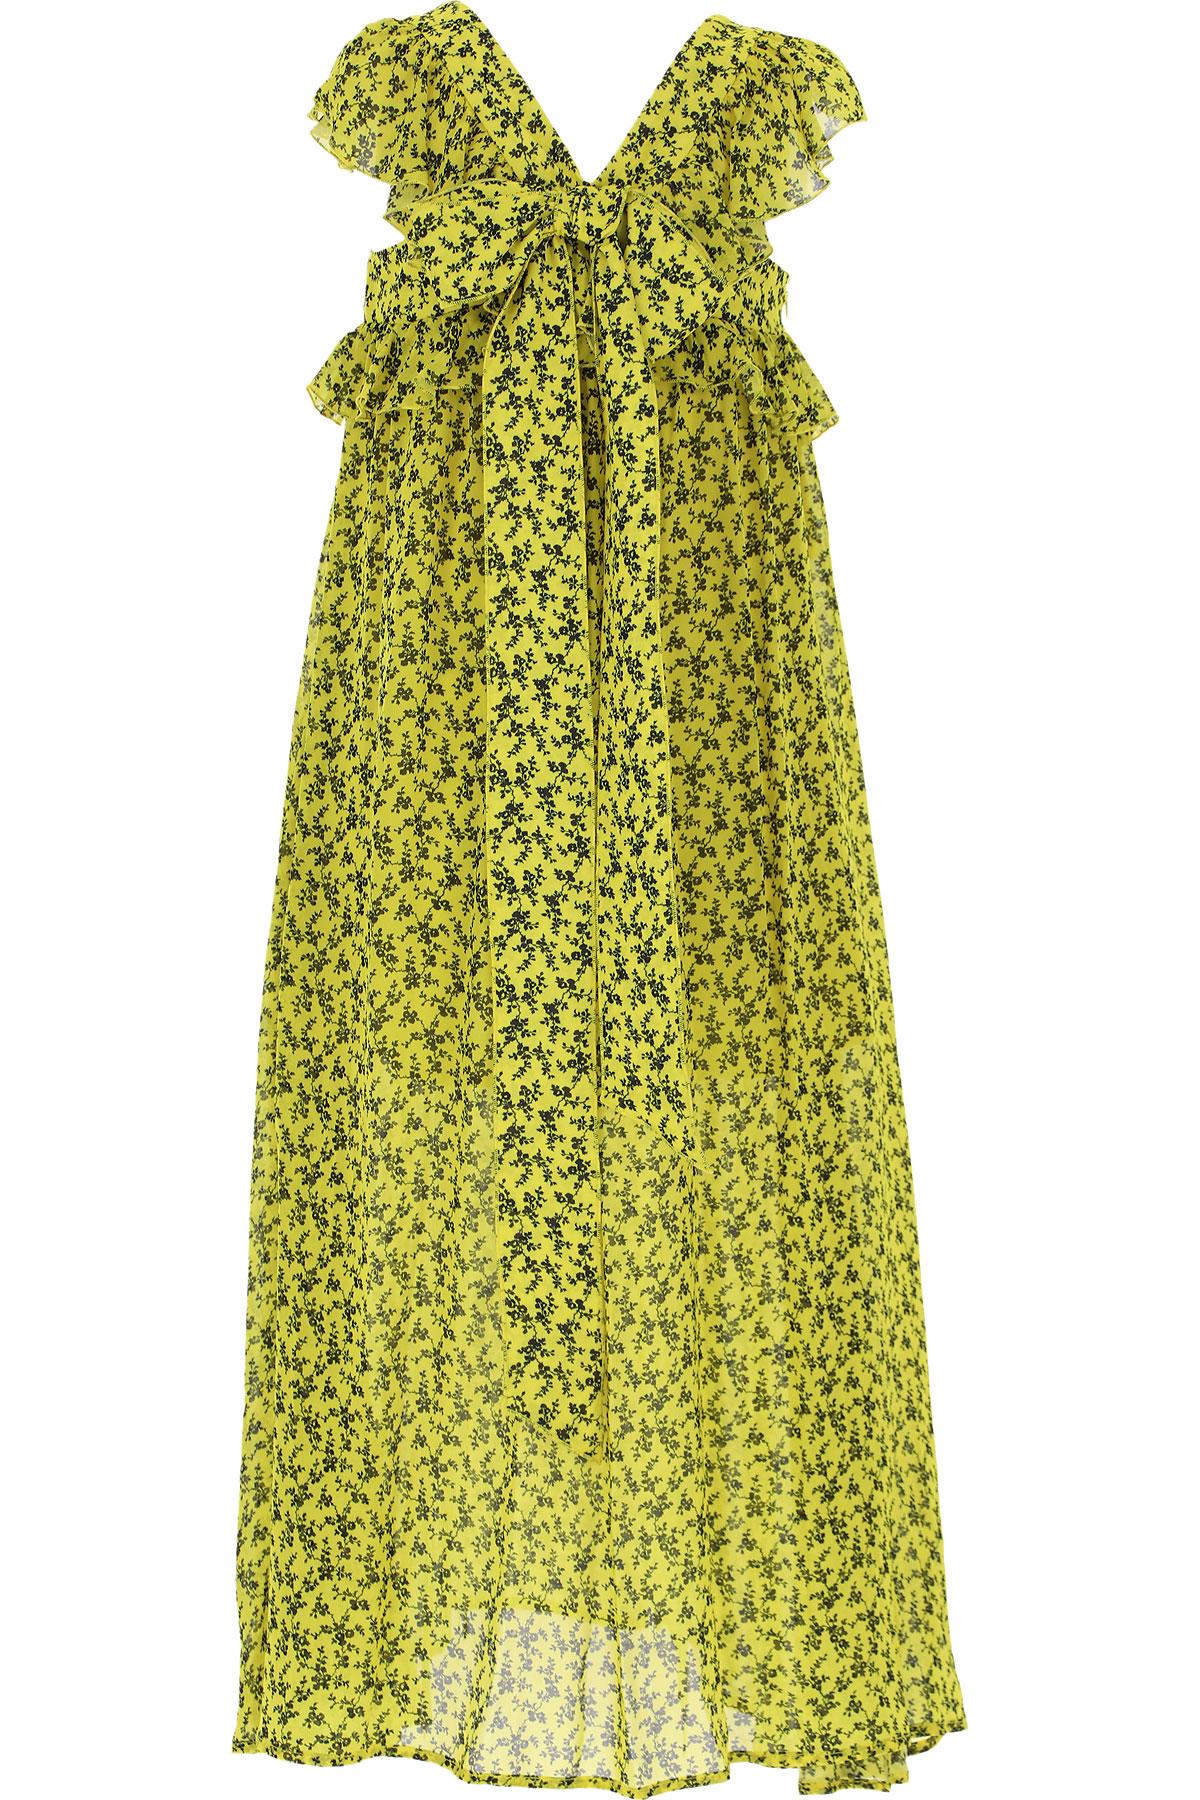 Philosophy di Lorenzo Serafini Girls Dress On Sale, Yellow, Viscose, 2019, L M XL